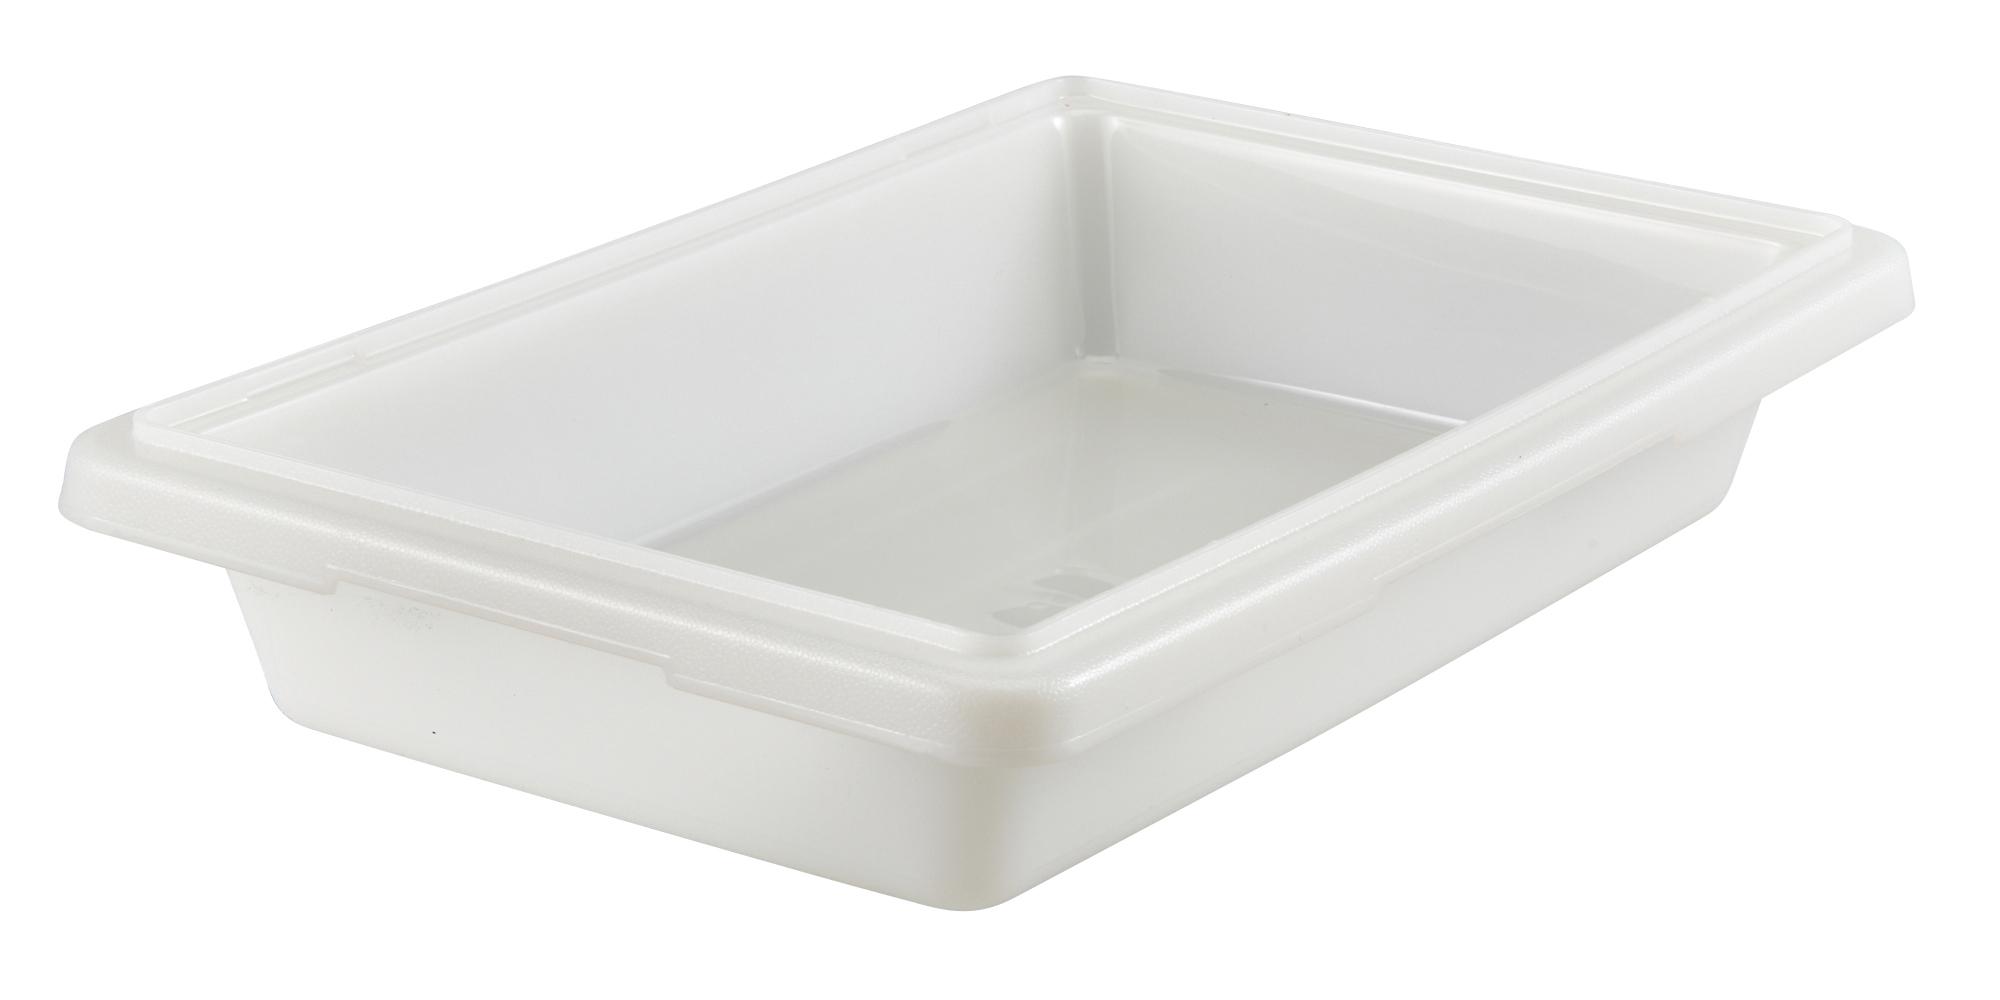 Cambro 12183P148 food/beverage storage container